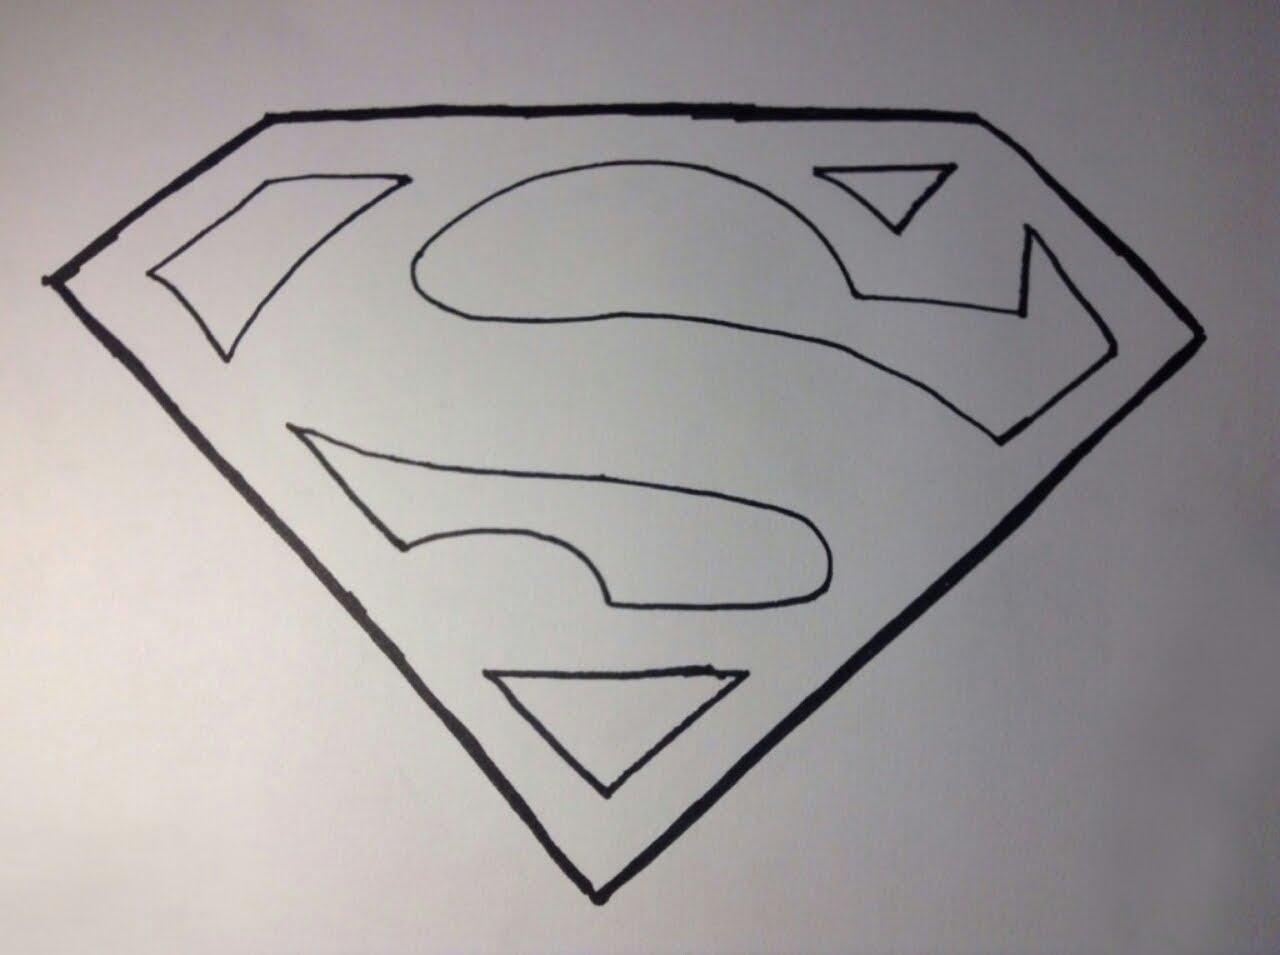 1280x955 How To Draw Superman39s Logo